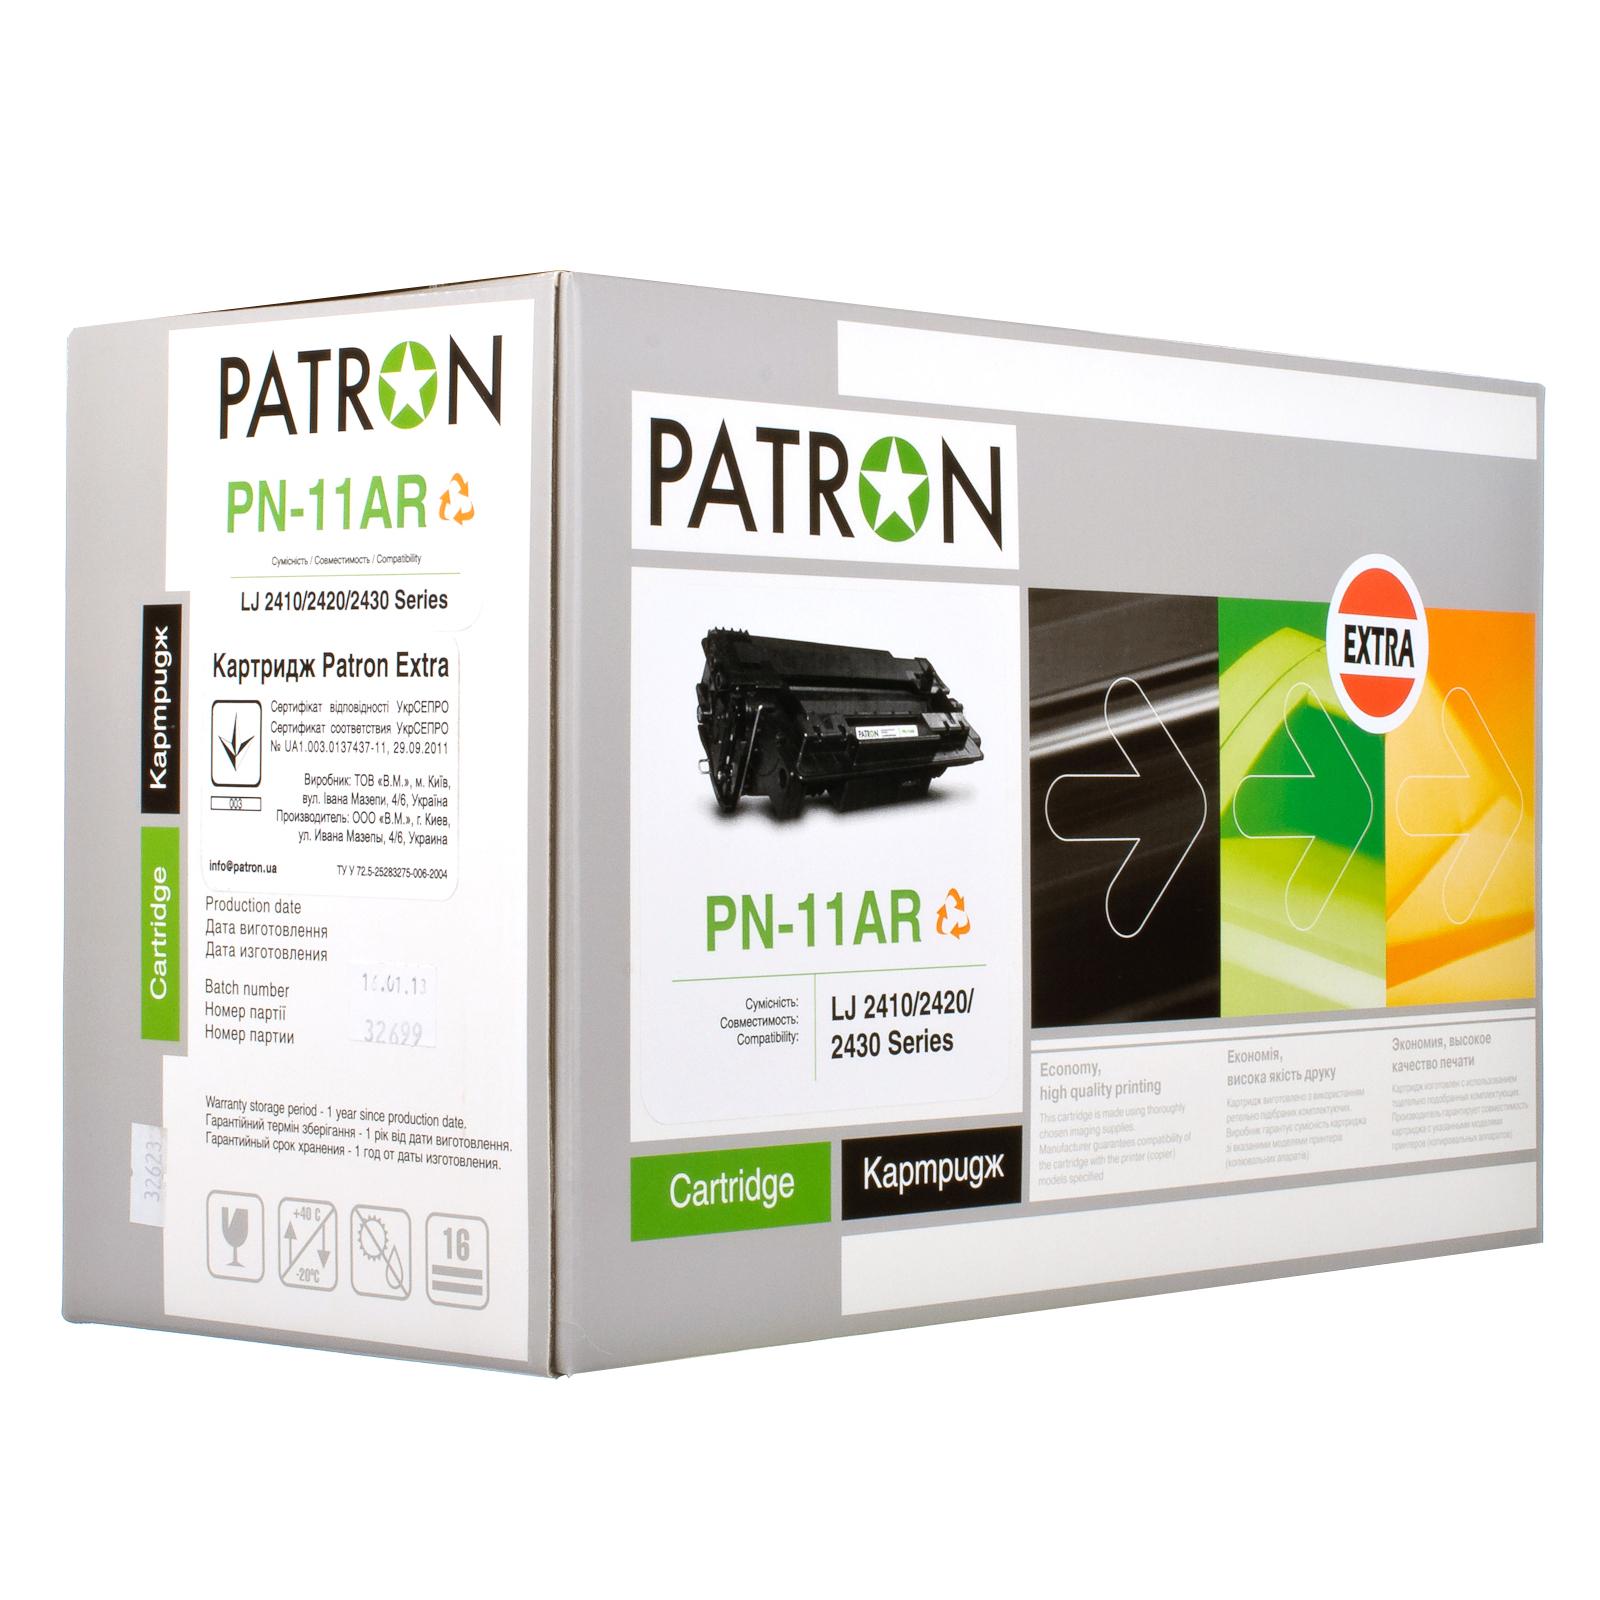 Картридж PATRON HP LJ2410/2420/2430 /Q6511A (PN-11AR) Extra (CT-HP-Q6511A-PN-R) изображение 2